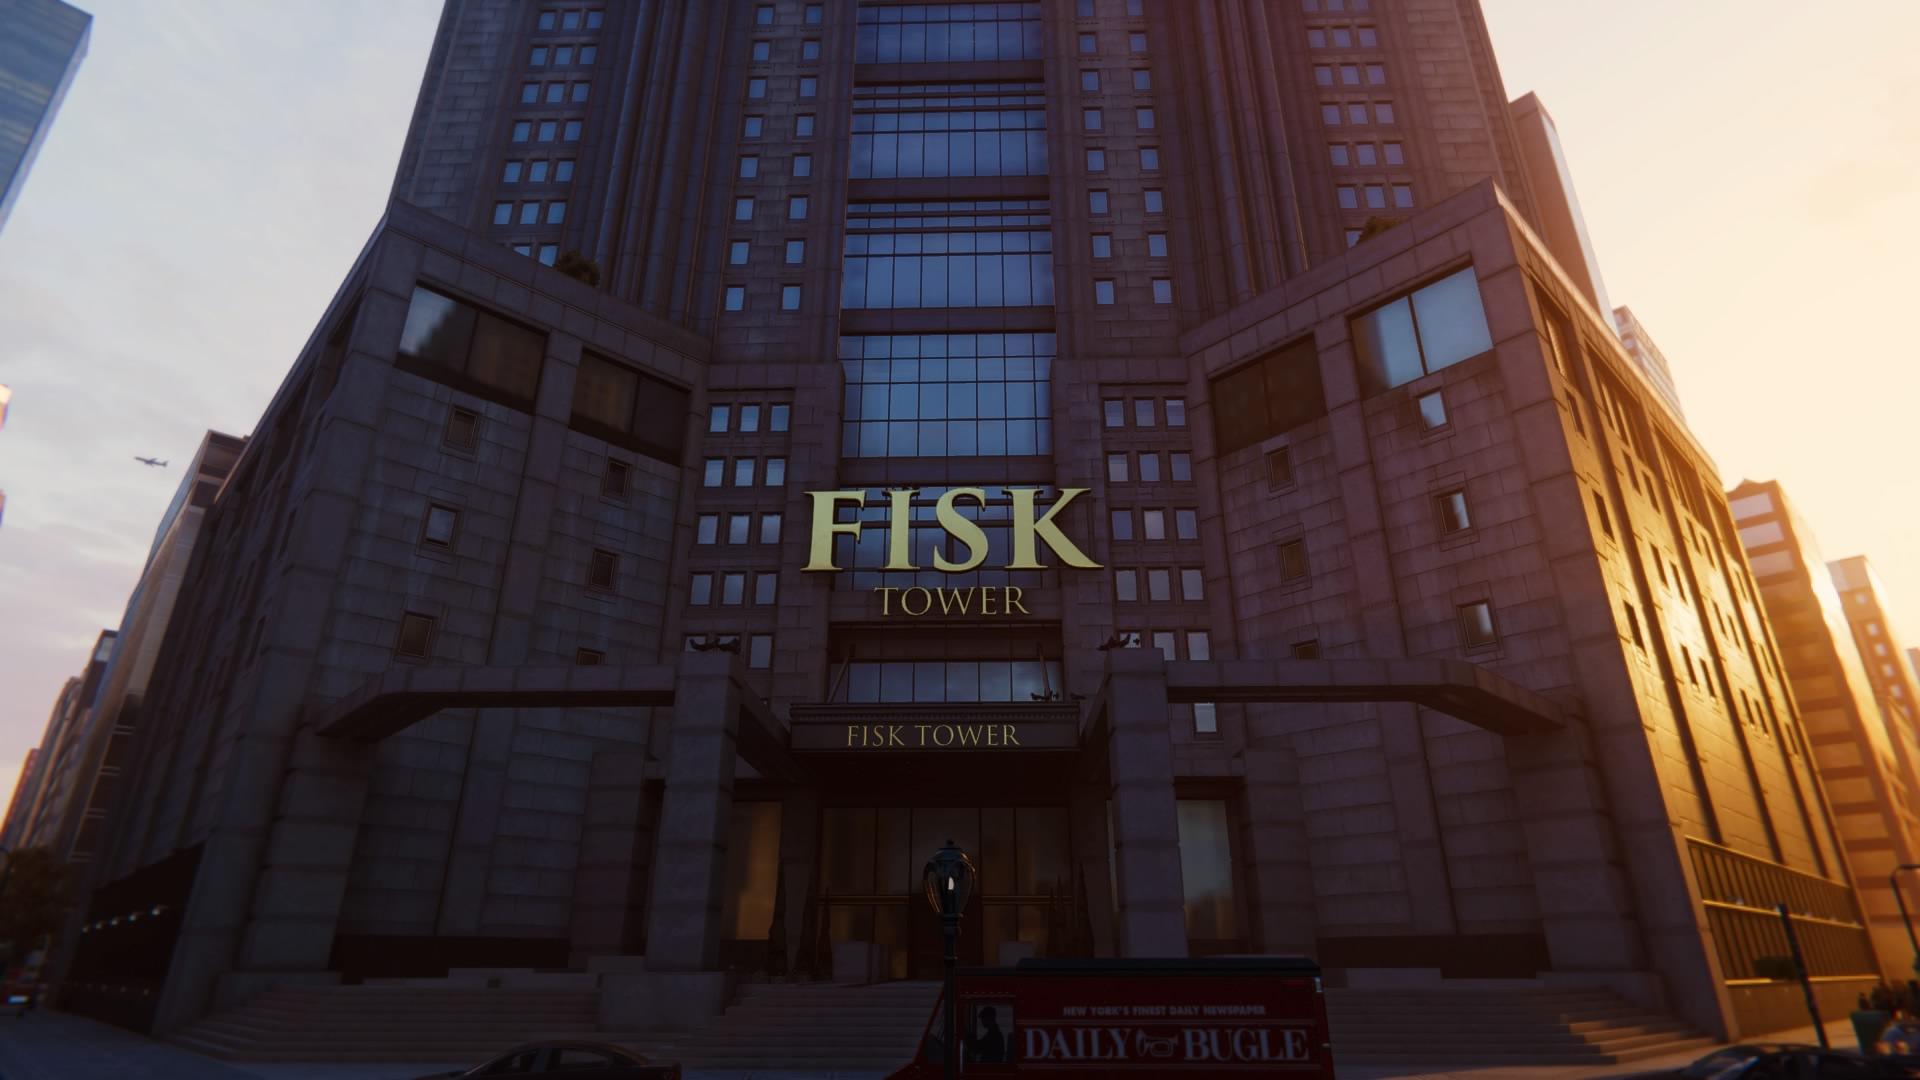 Fisk Industries (Earth-1048)